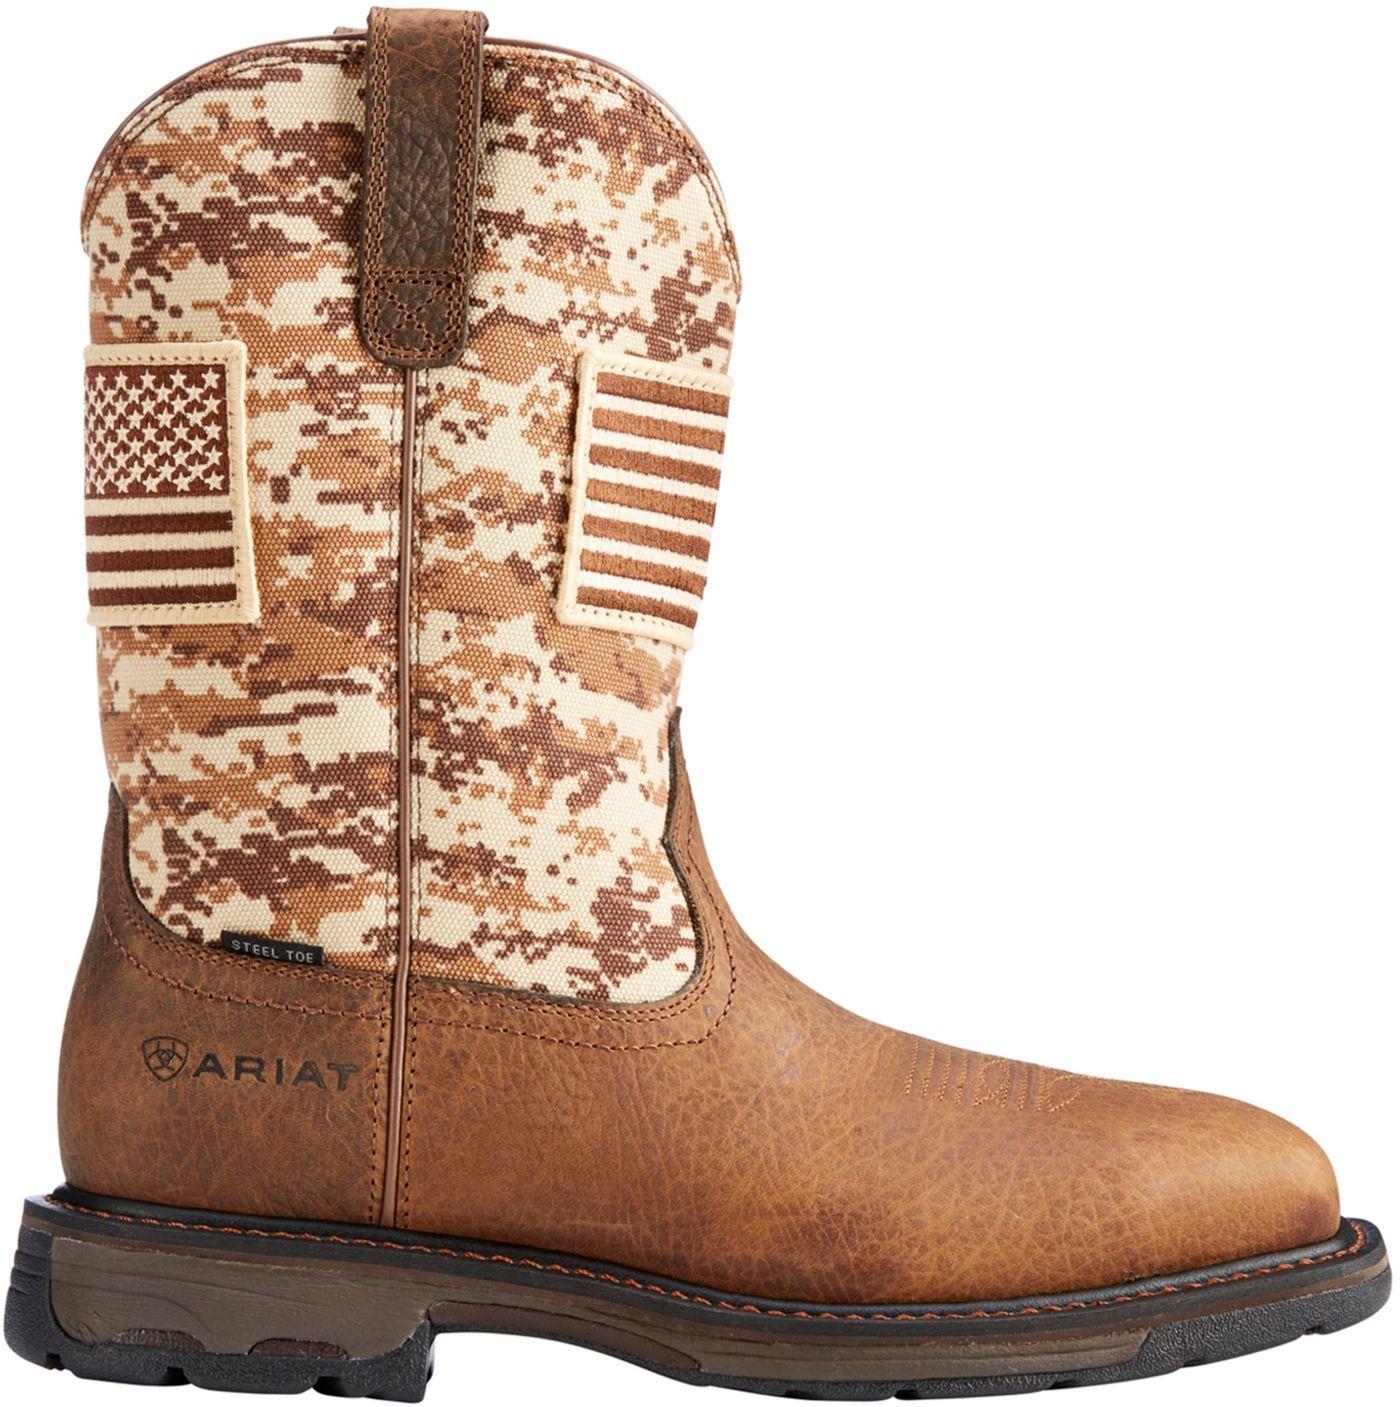 Ariat Men's Workhog Patriot Steel Toe Western Work Boots